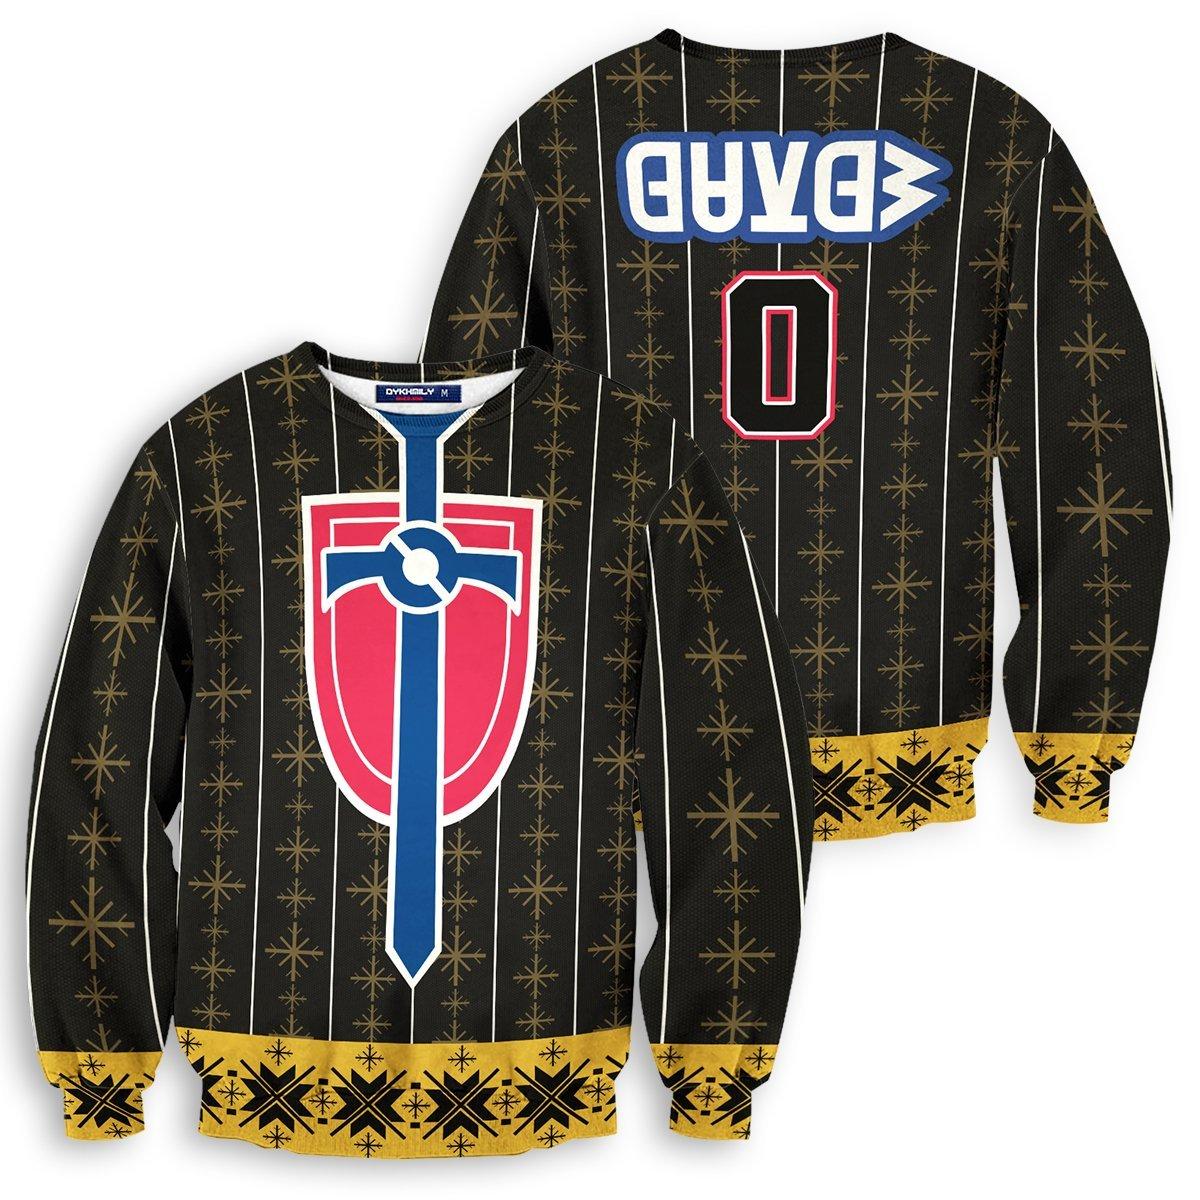 Personalized Pokemon Champion Uniform Unisex Wool Sweater FDM0310 S Official Otaku Treat Merch